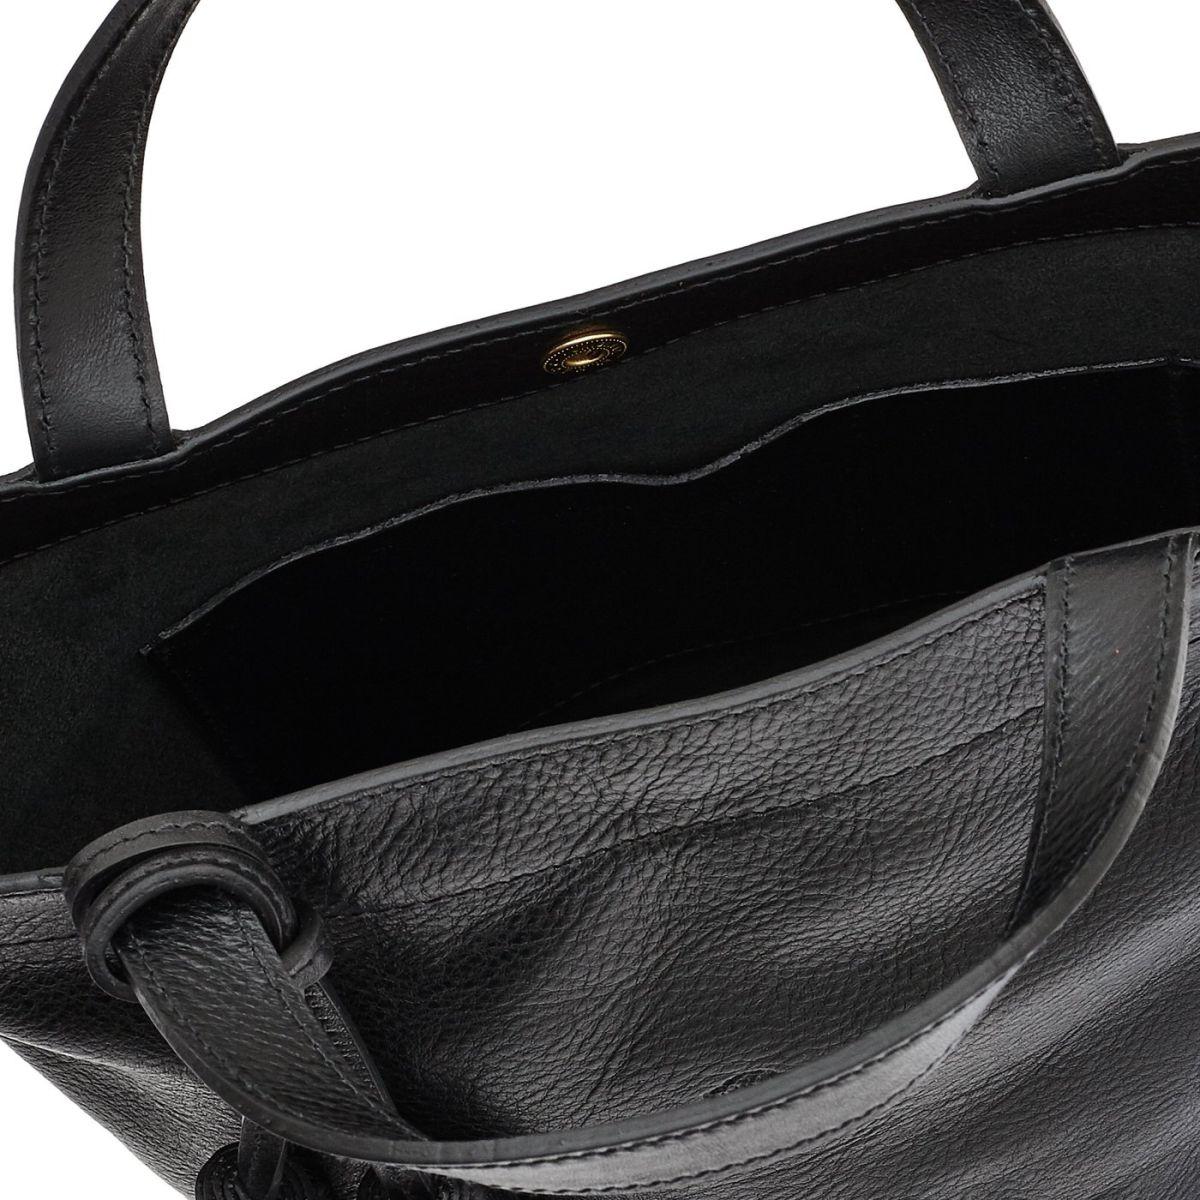 Cristina - Women's Handbag in Cowhide Double Leather color Black - Stibbert line BTH045 | Details